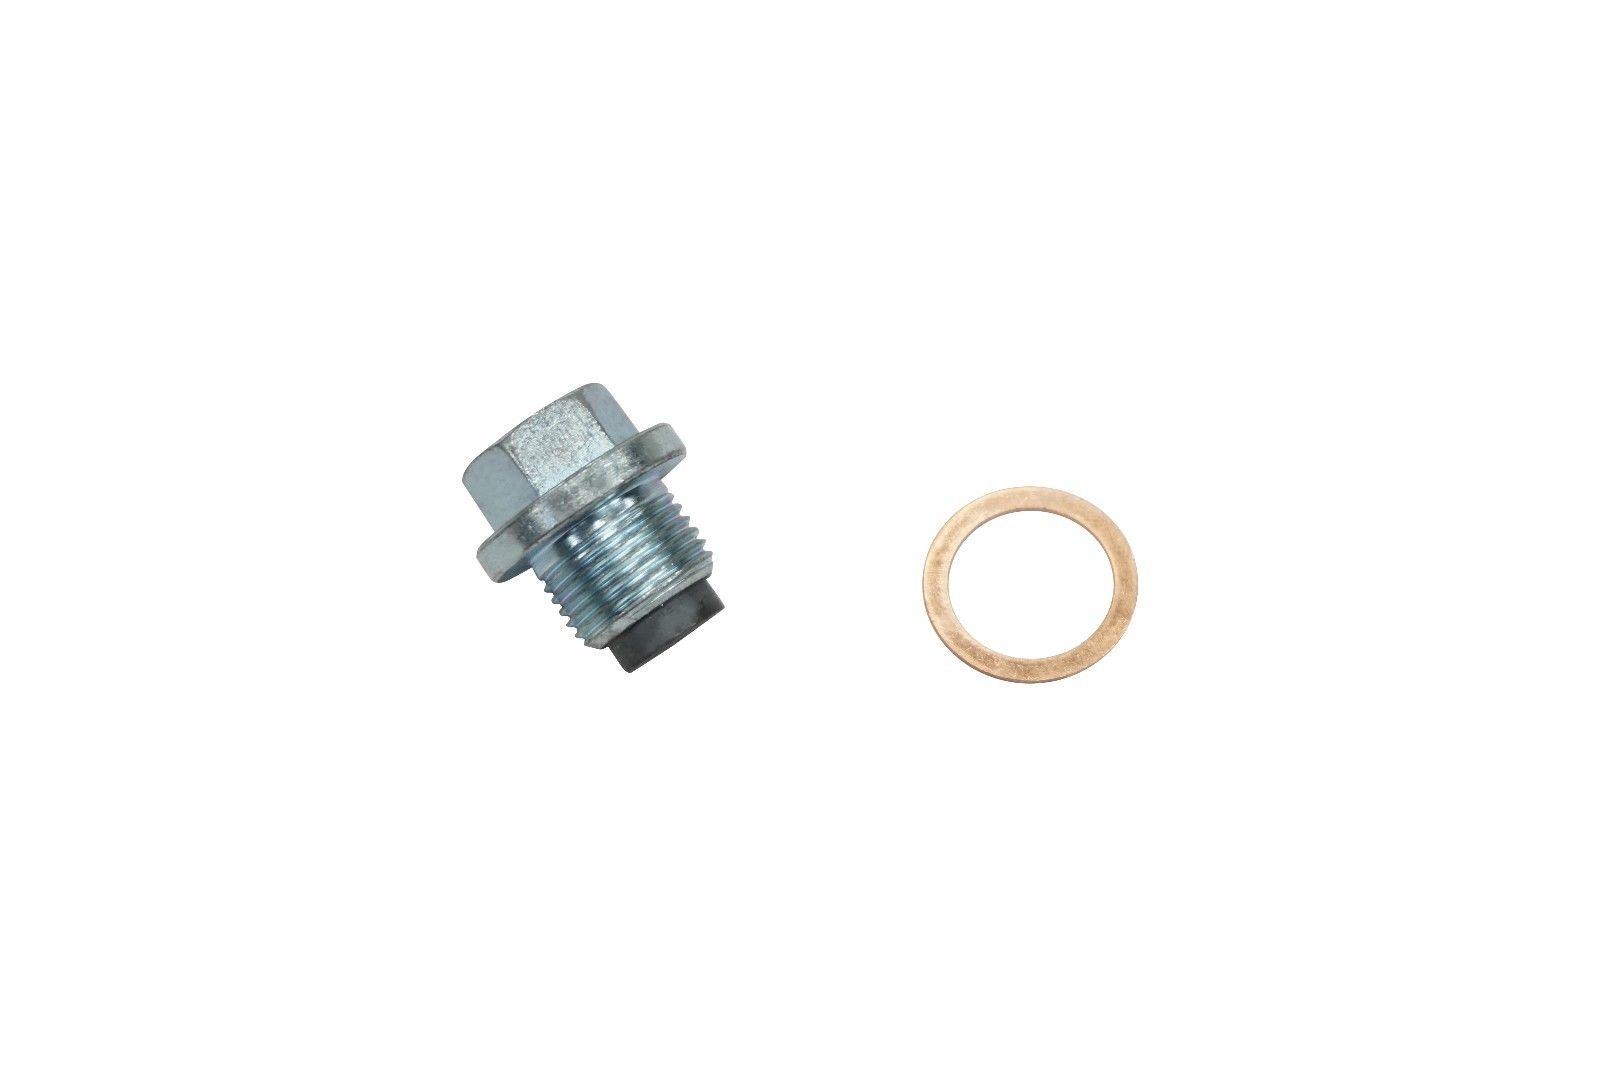 Magnetic Engine Oil Drain Plug for 03-18 5.9L 6.7L Cummins ISB